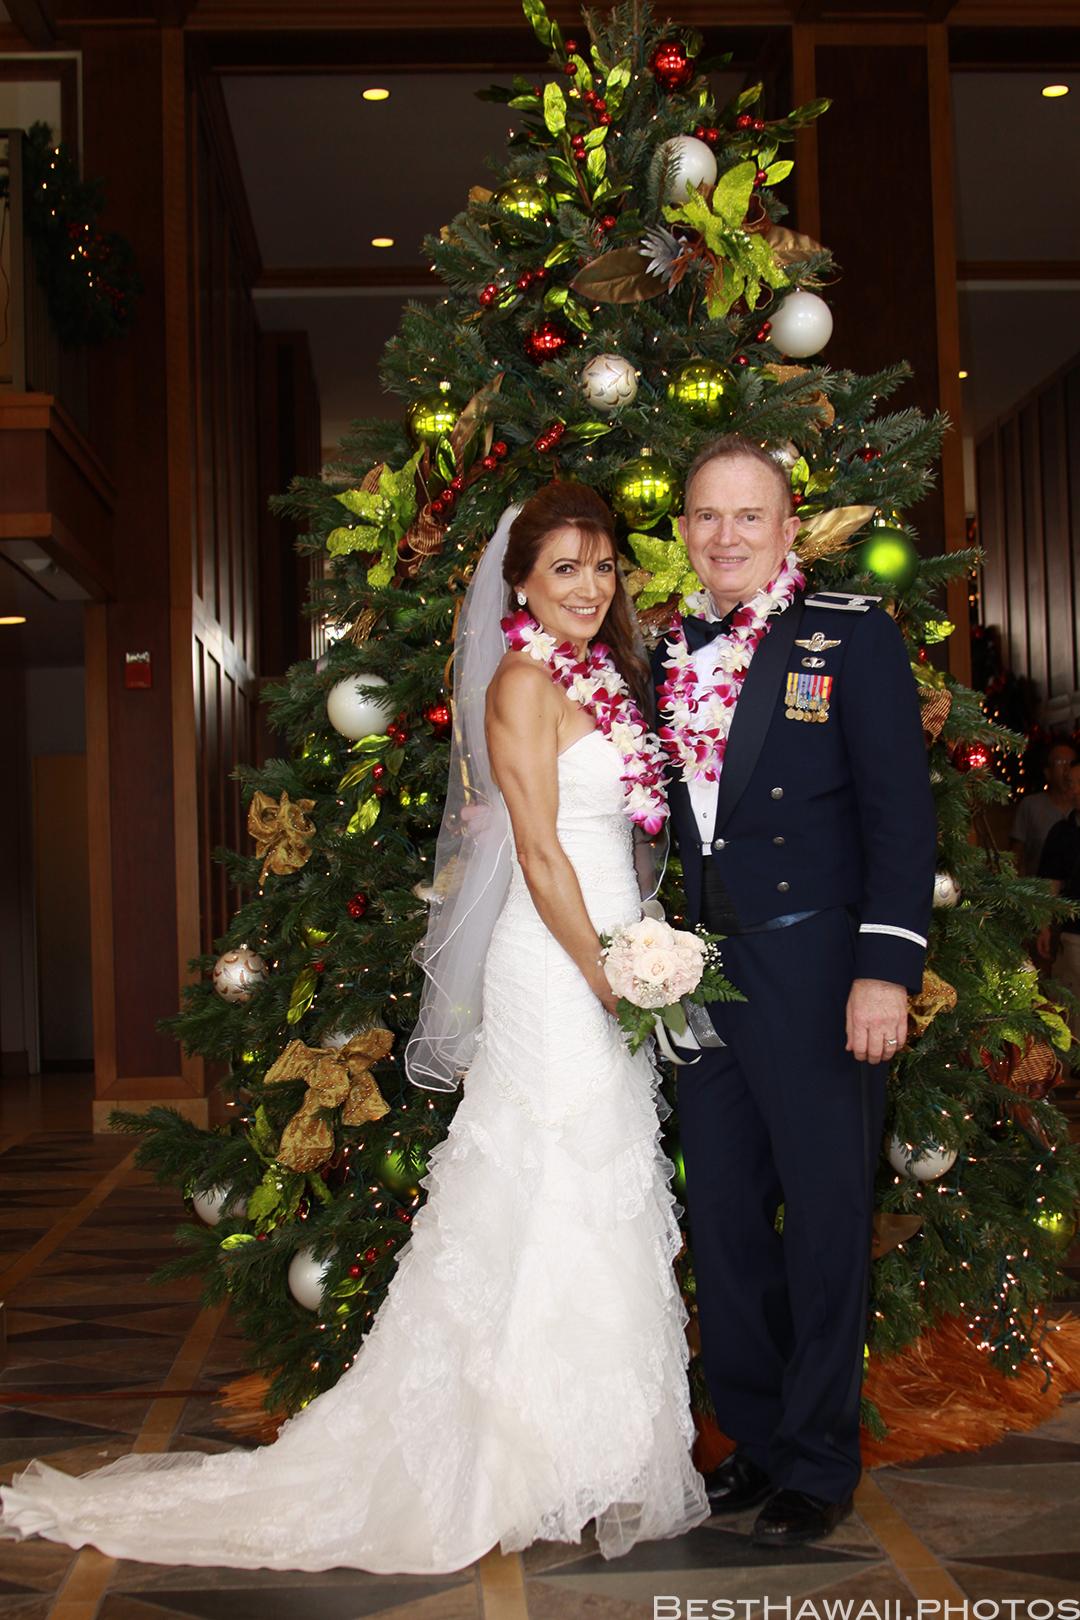 Wedding Photos at Hilton Hawaiian Village by Pasha www.BestHawaii.photos 121820158642